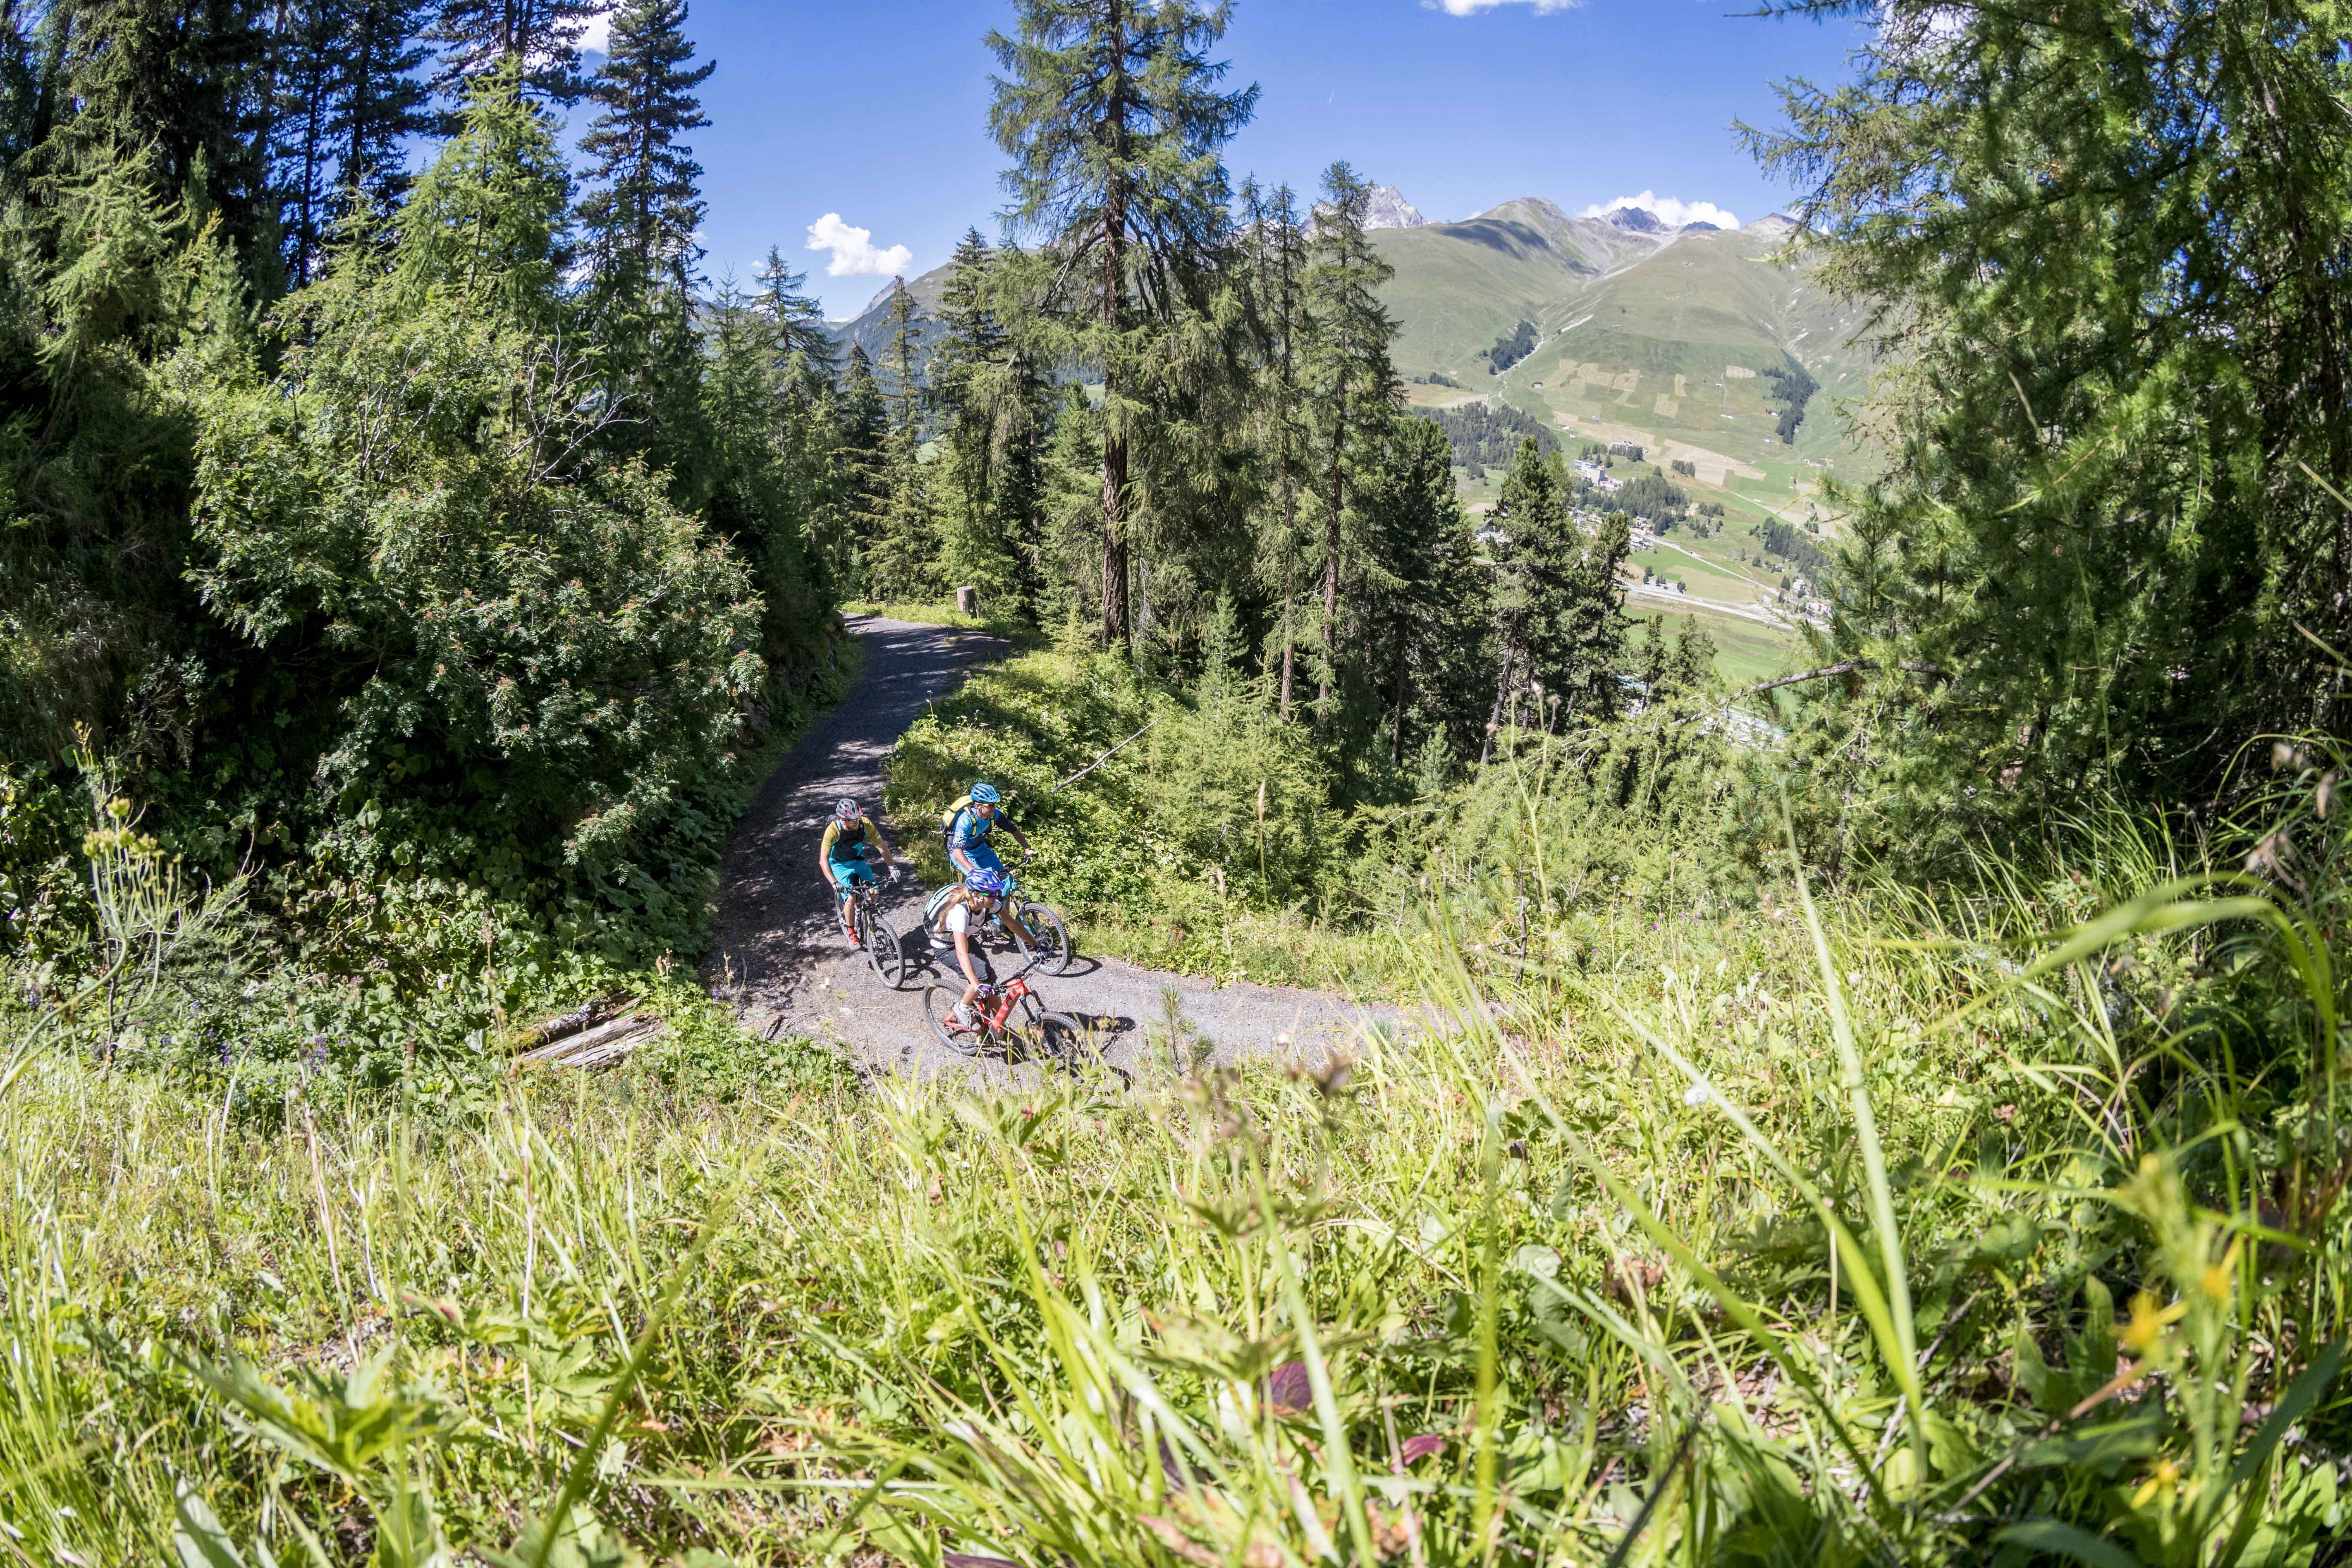 Biker at Forrest Staz